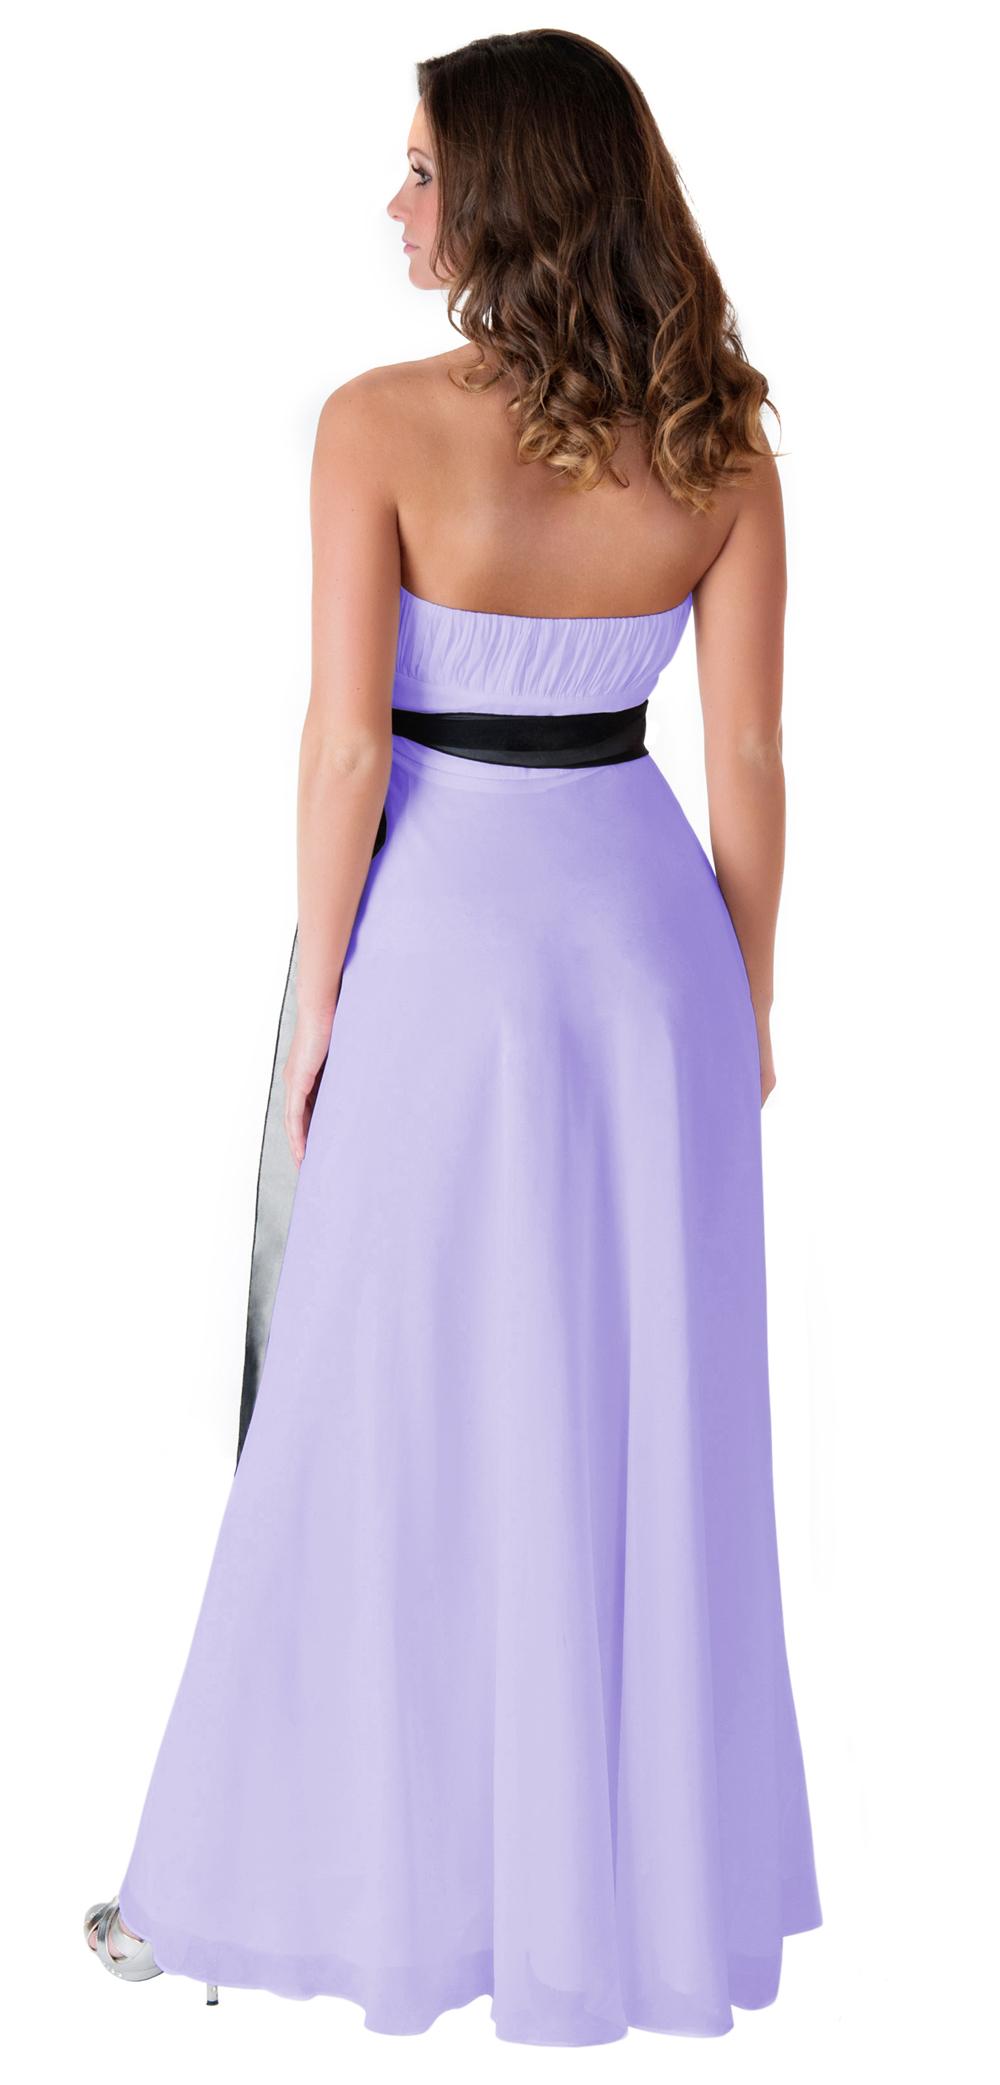 Graduation Dresses Xs 93